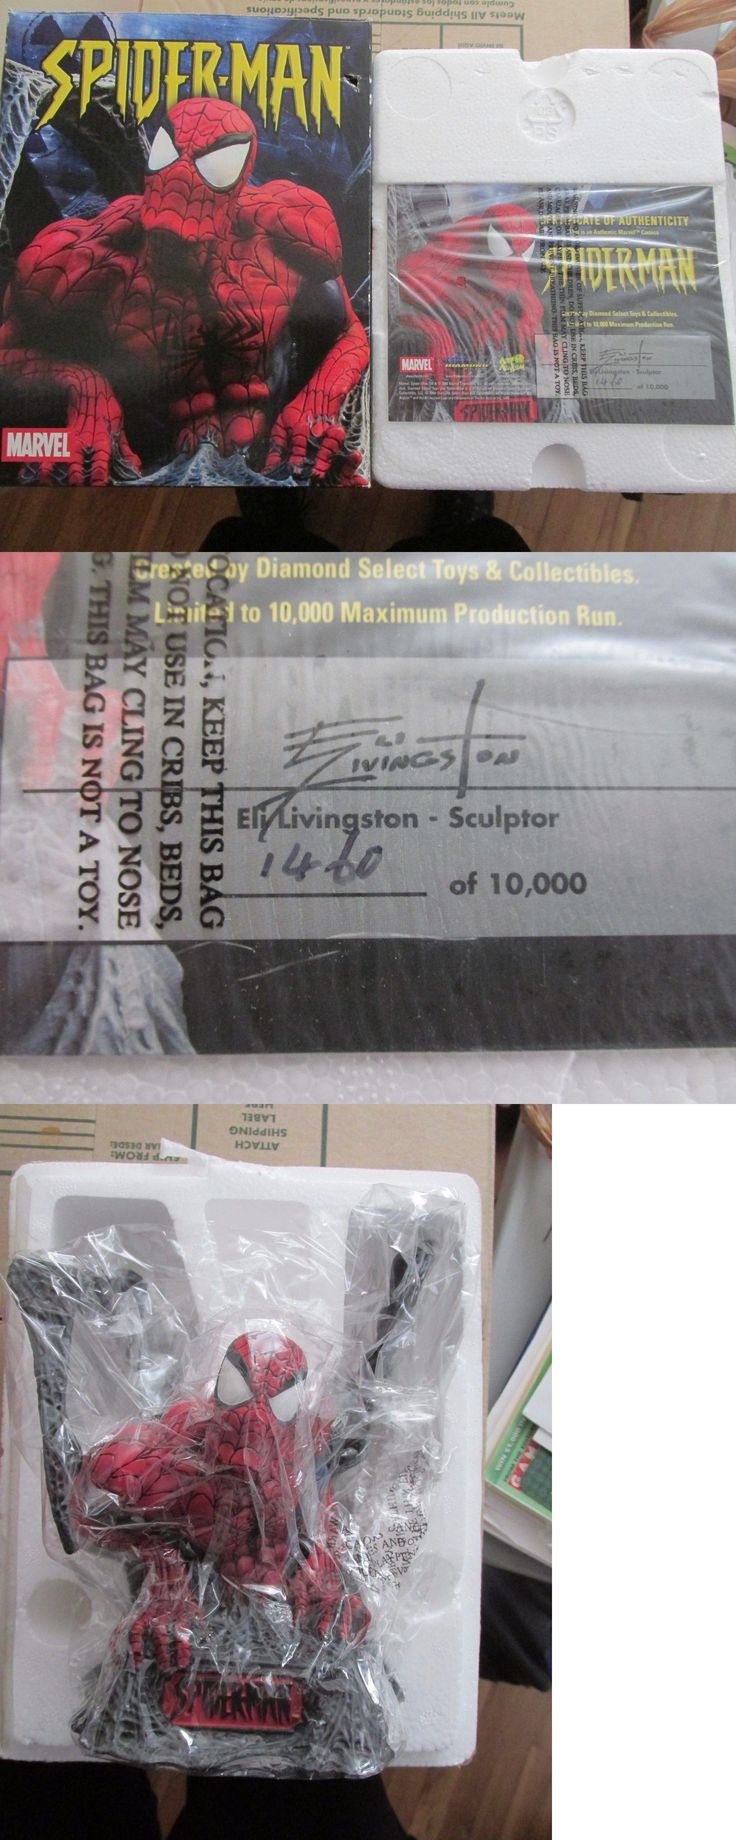 Spider-Man 146094: Spiderman 2004 Marvel Universe Diamond Art Asylum Bust Eli Livingston 1460 10000 -> BUY IT NOW ONLY: $44.99 on eBay!